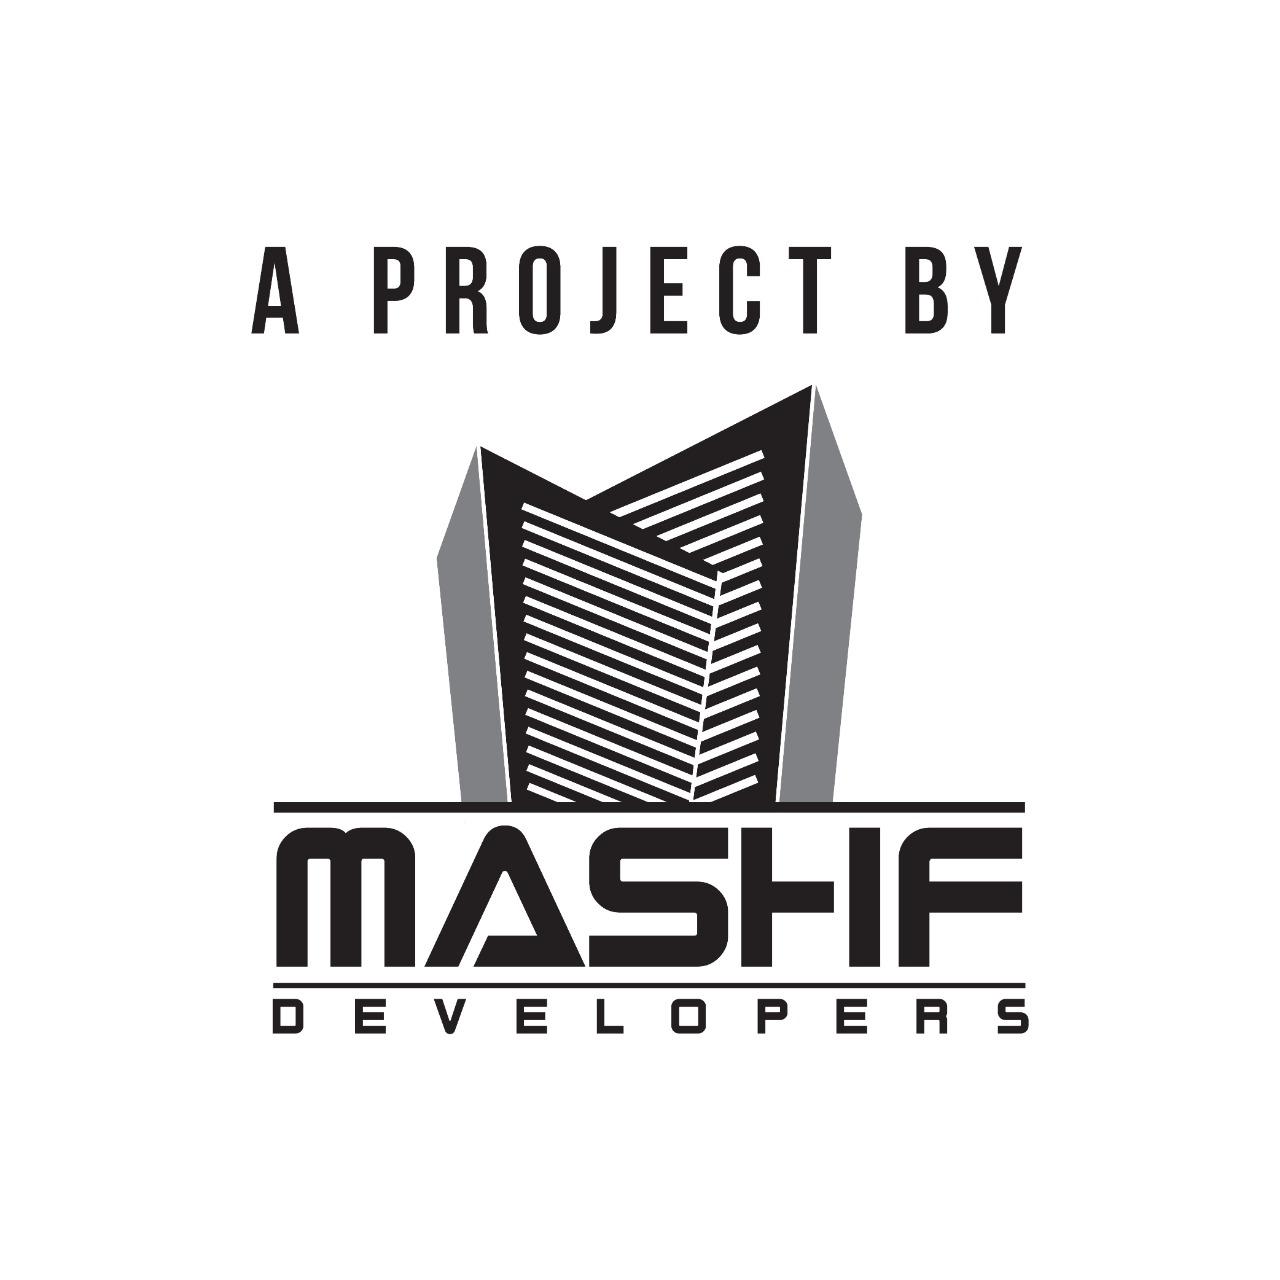 MASHF Developers Pvt Ltd